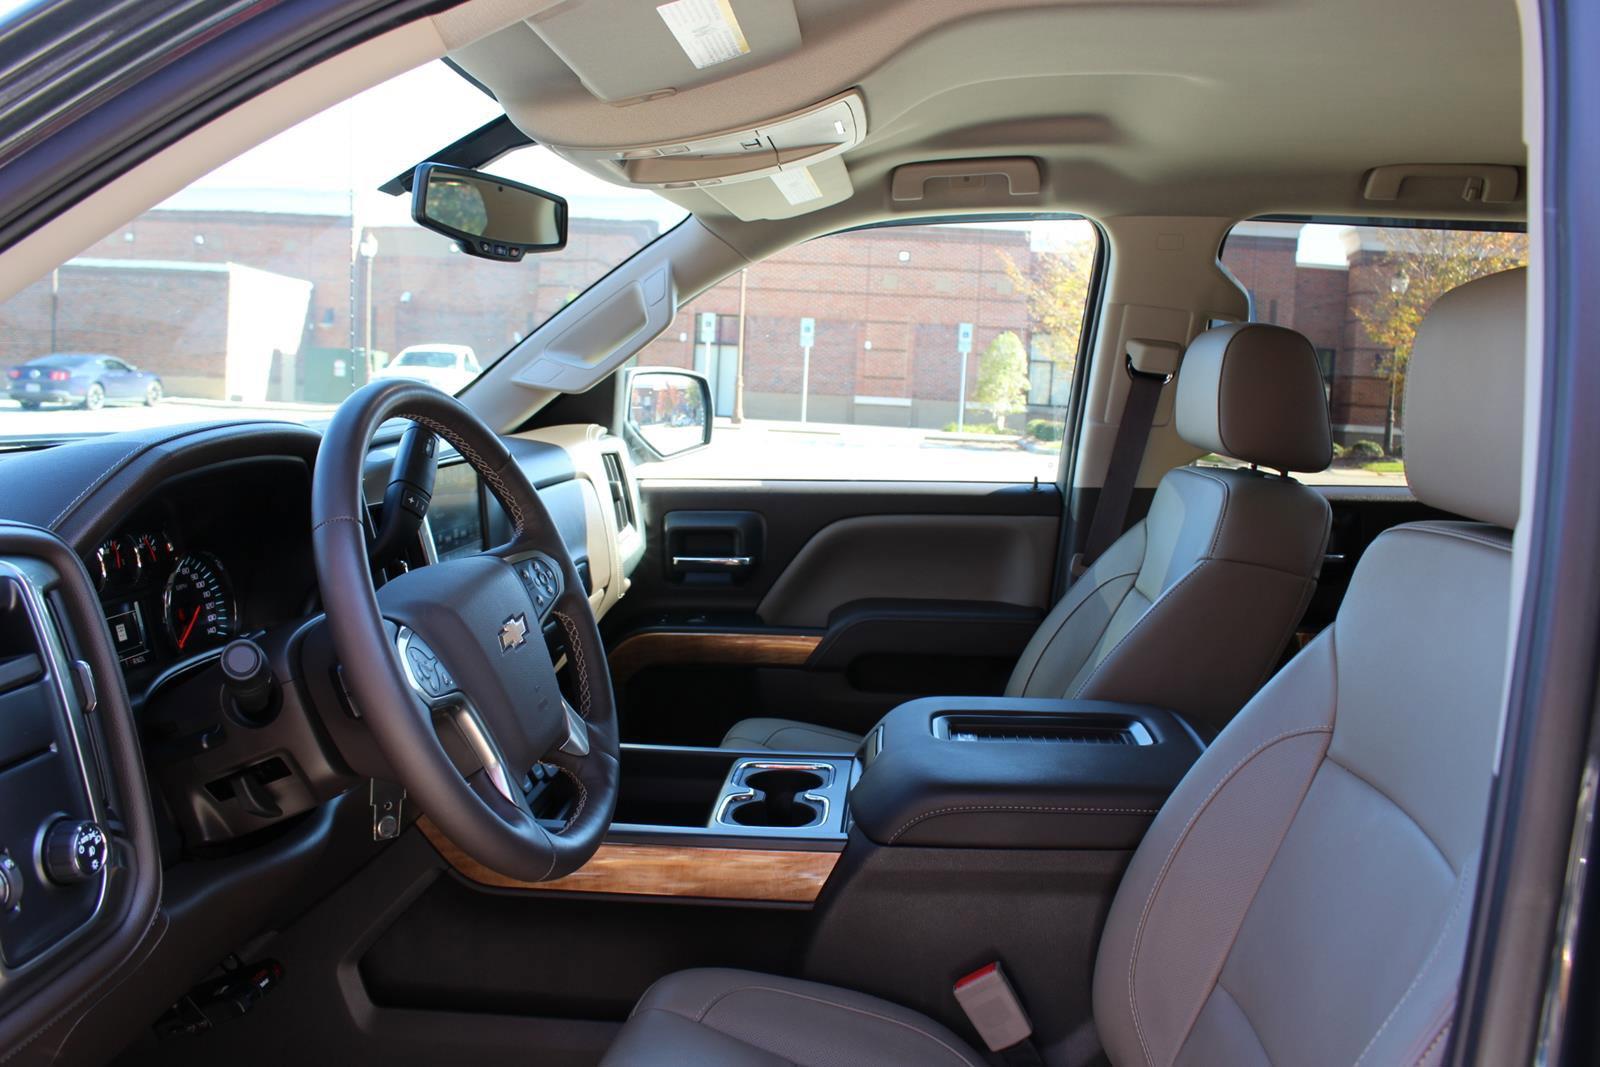 Certified Pre-Owned 2018 Chevrolet Silverado 1500 LTZ